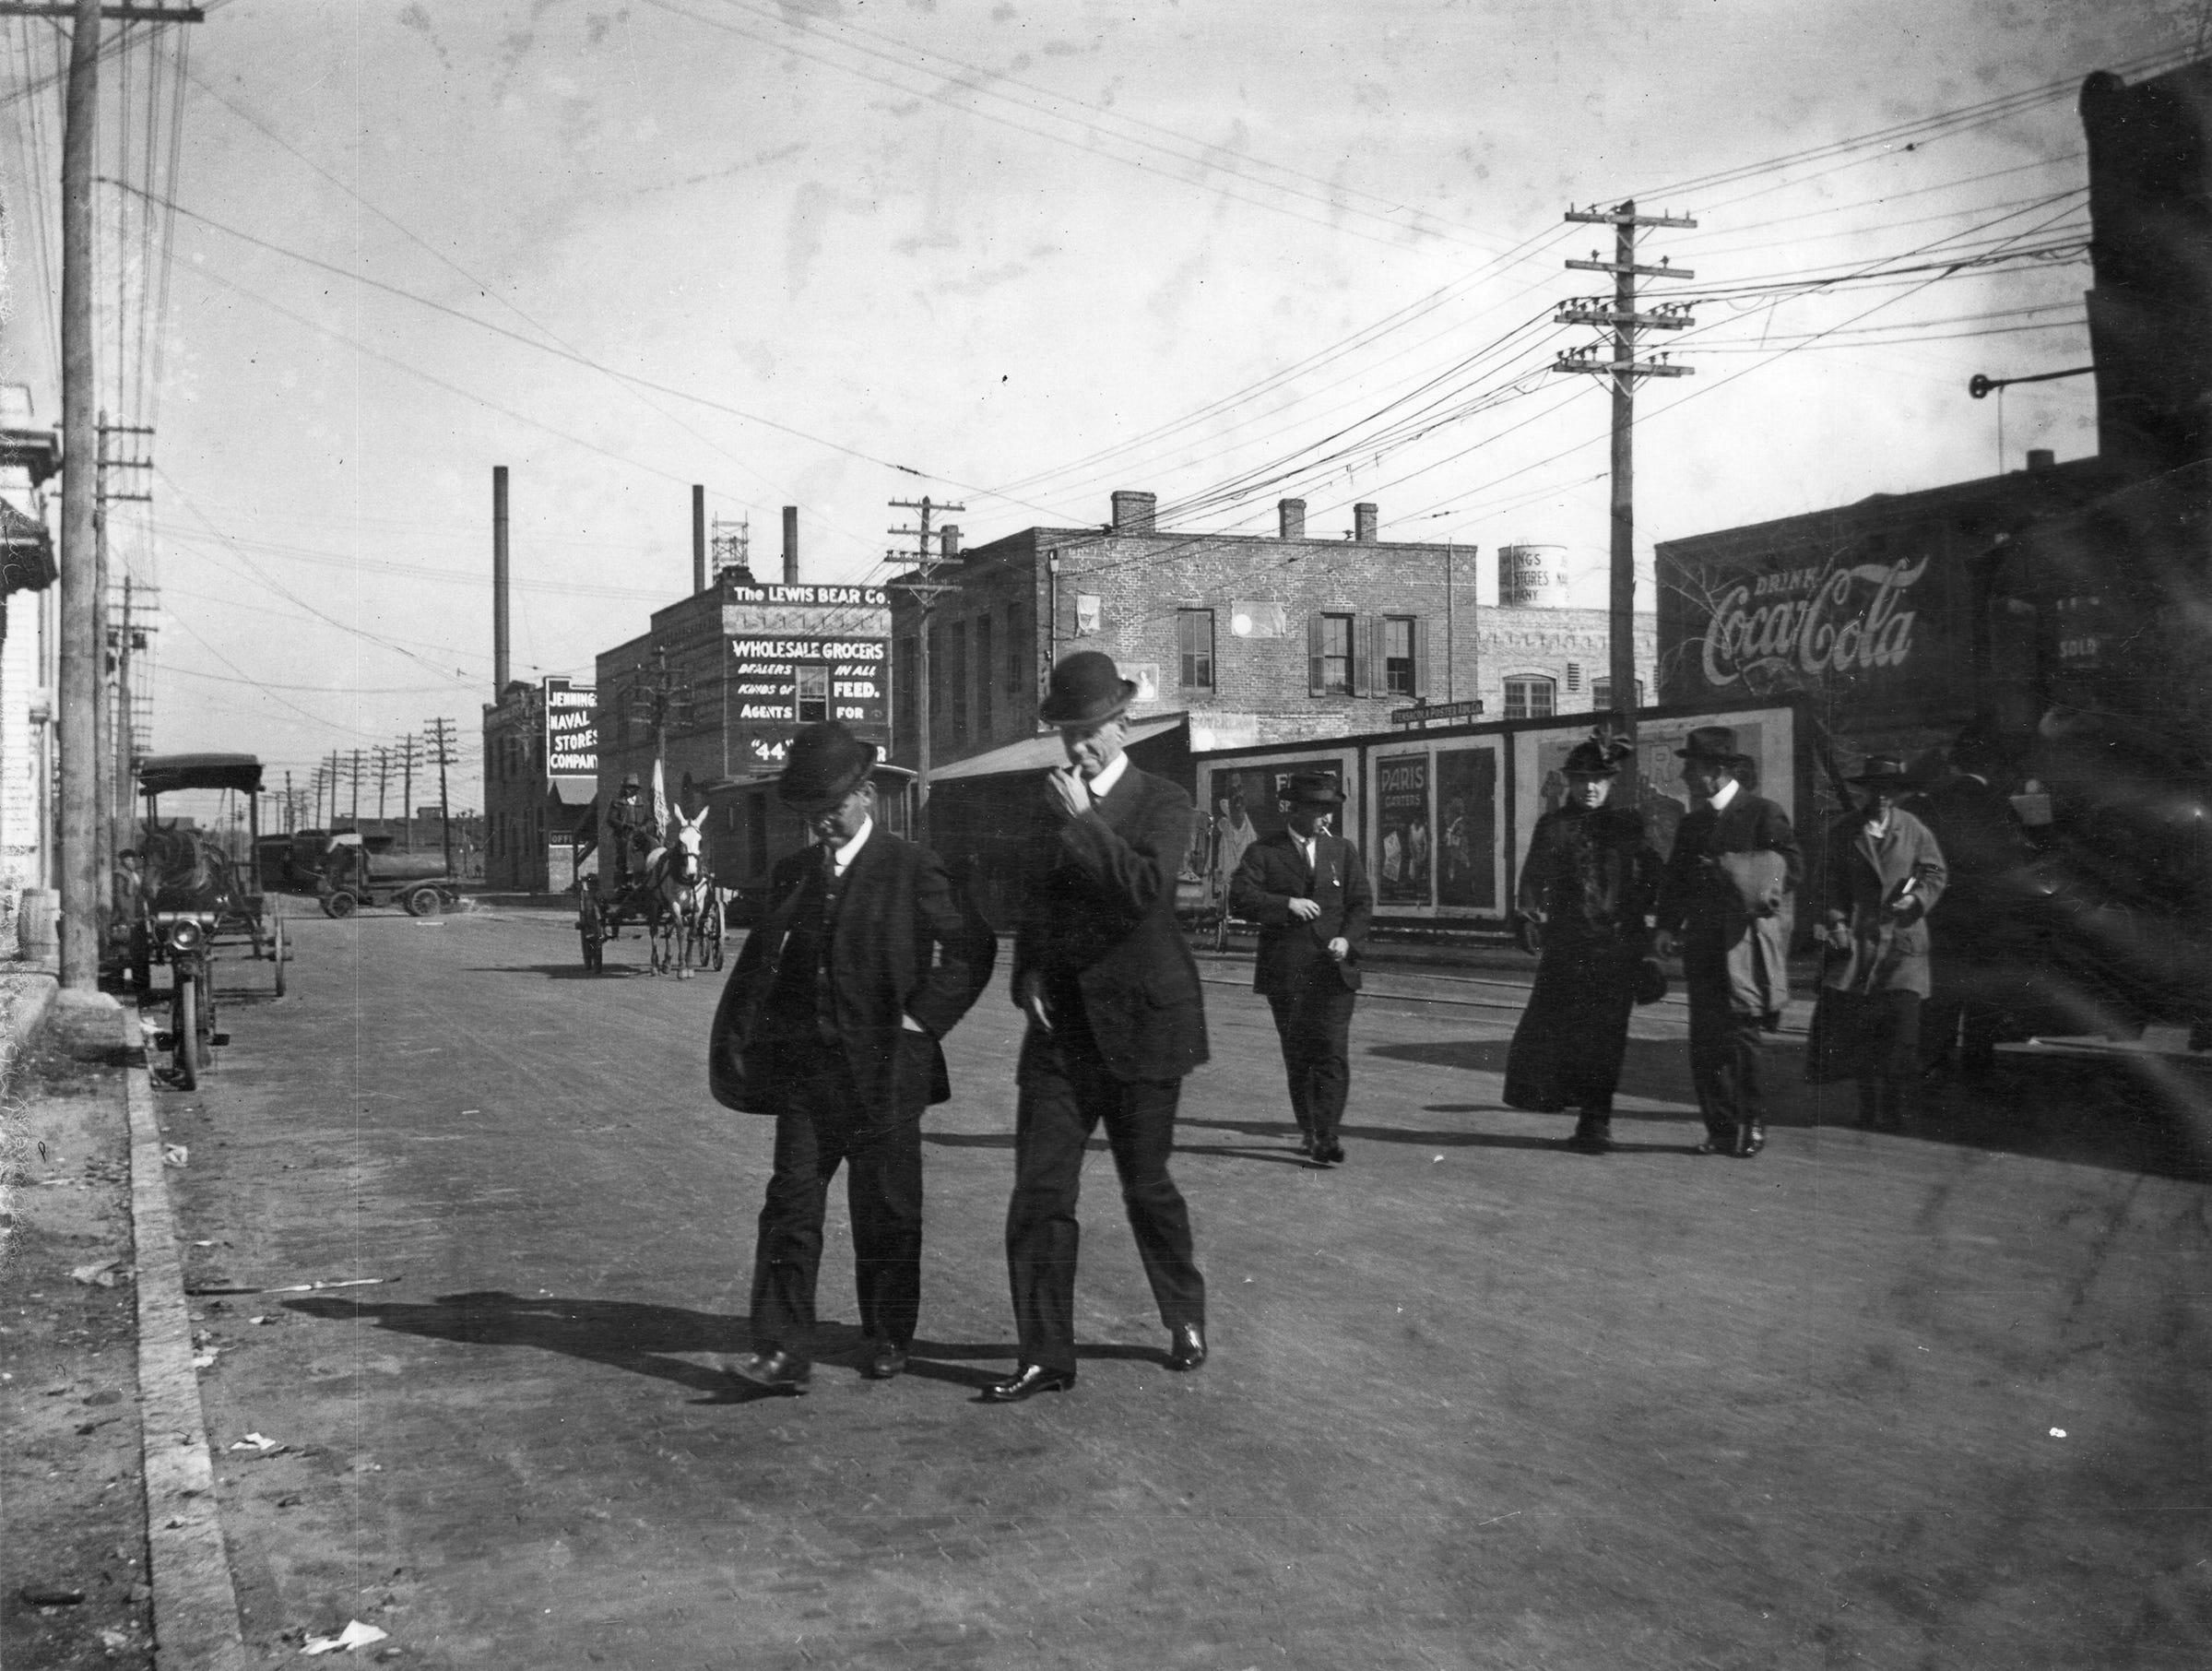 Palafox Street in 1900s.